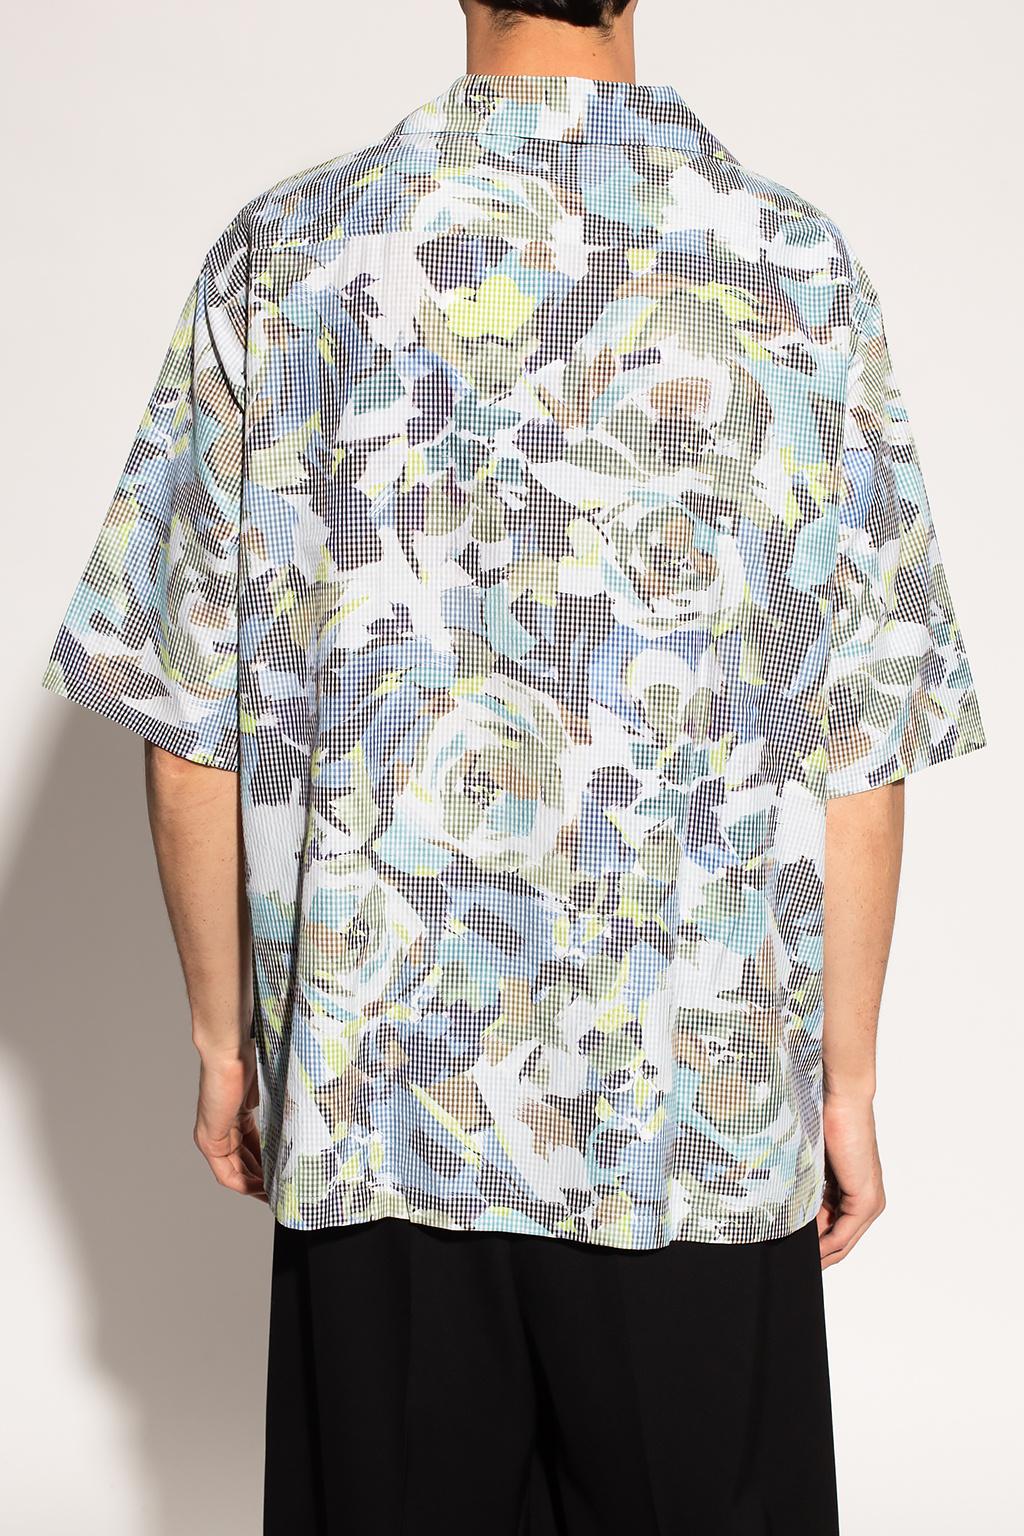 Kenzo Short-sleeved shirt